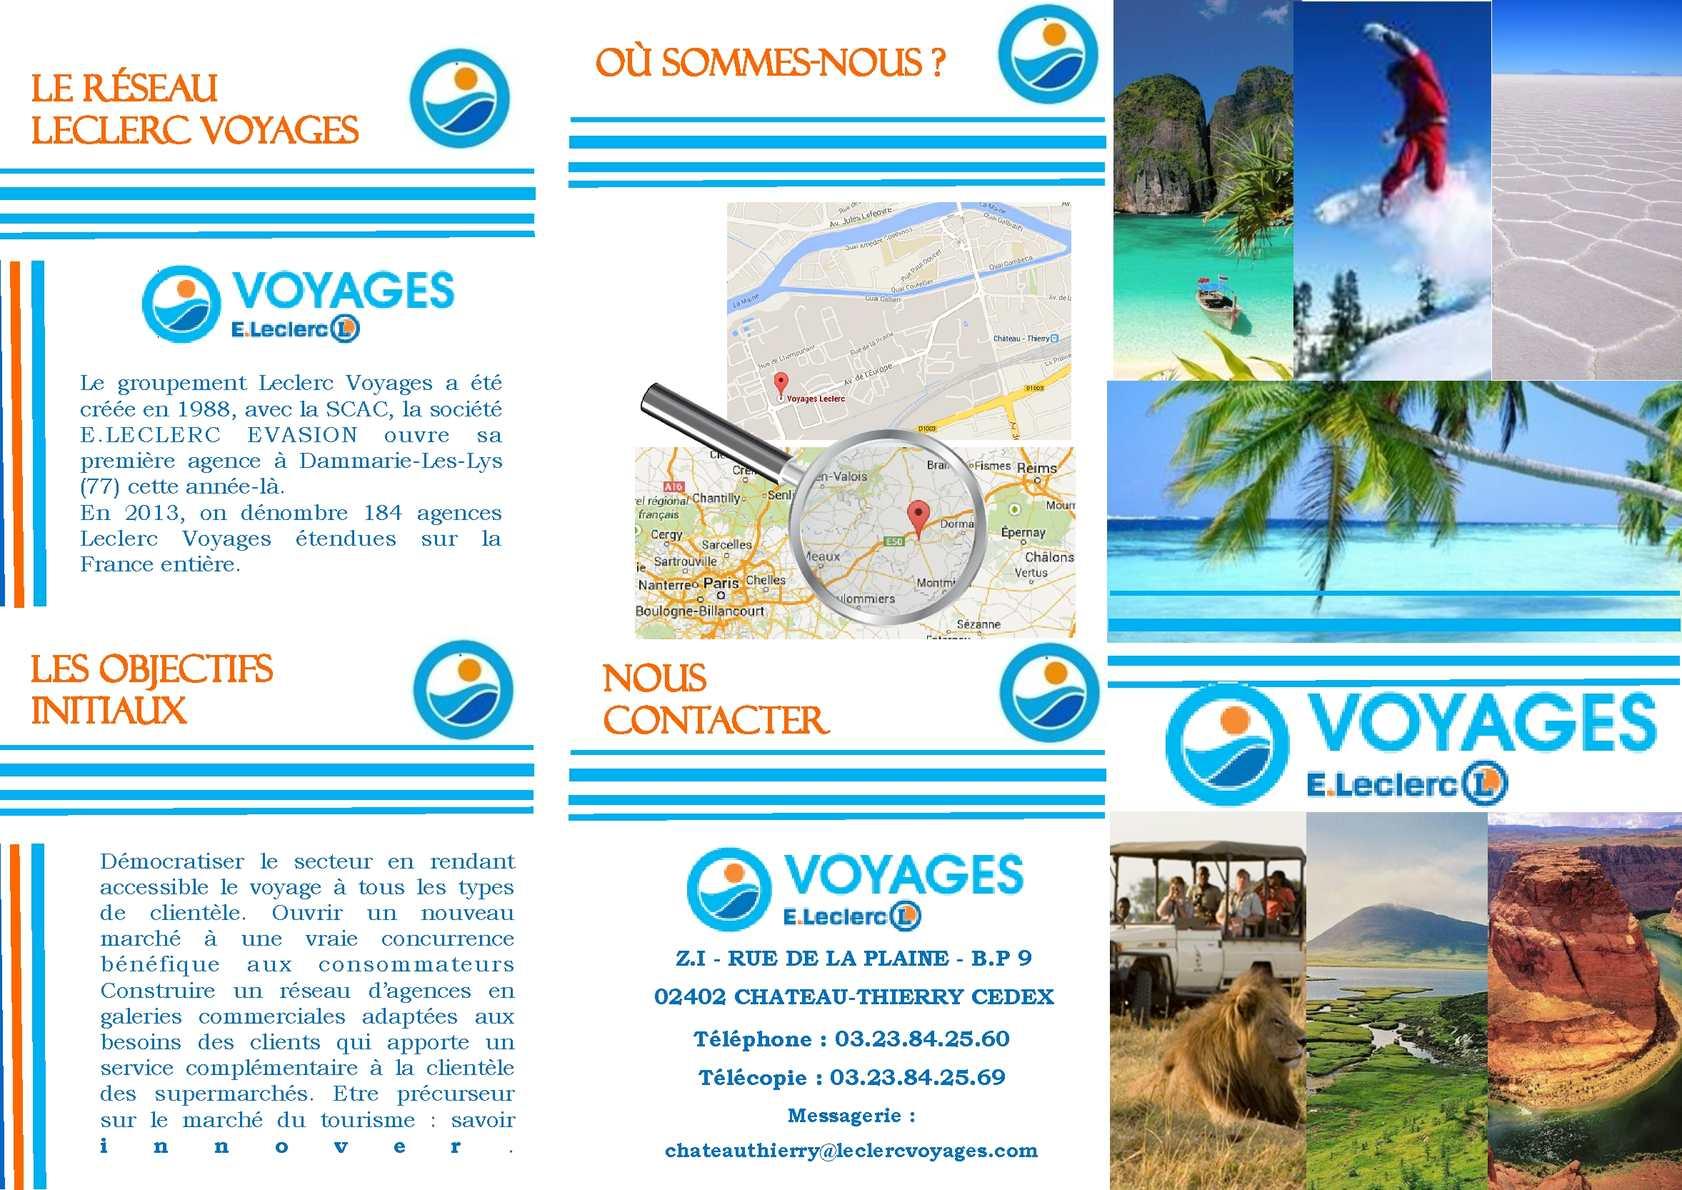 Calam o flyer leclerc voyages for Leclerc brochure